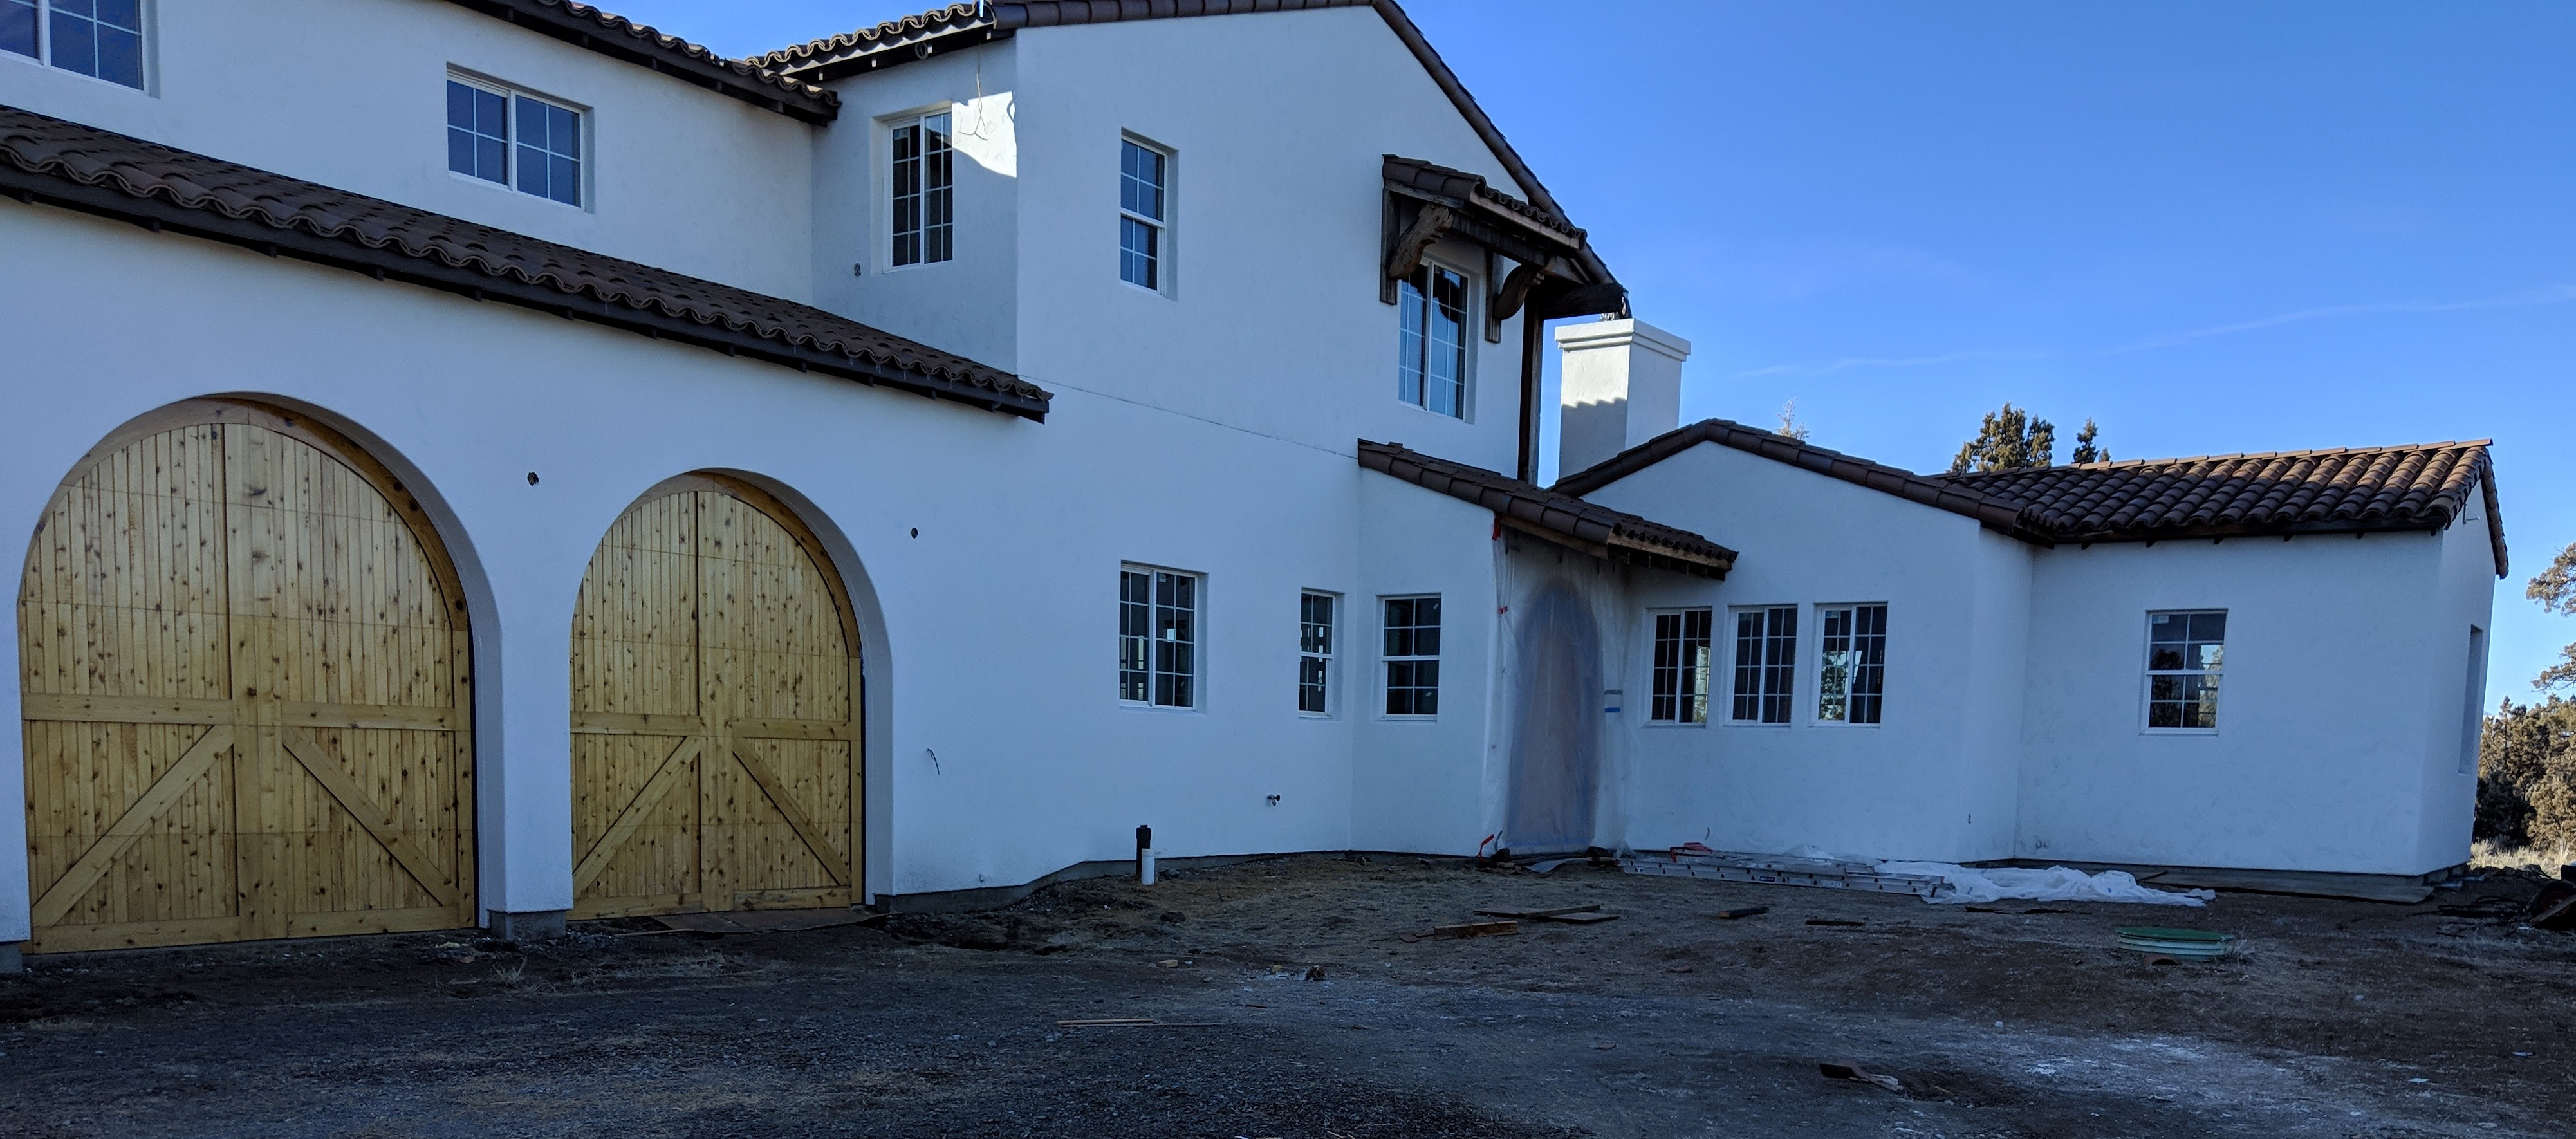 exterior10119